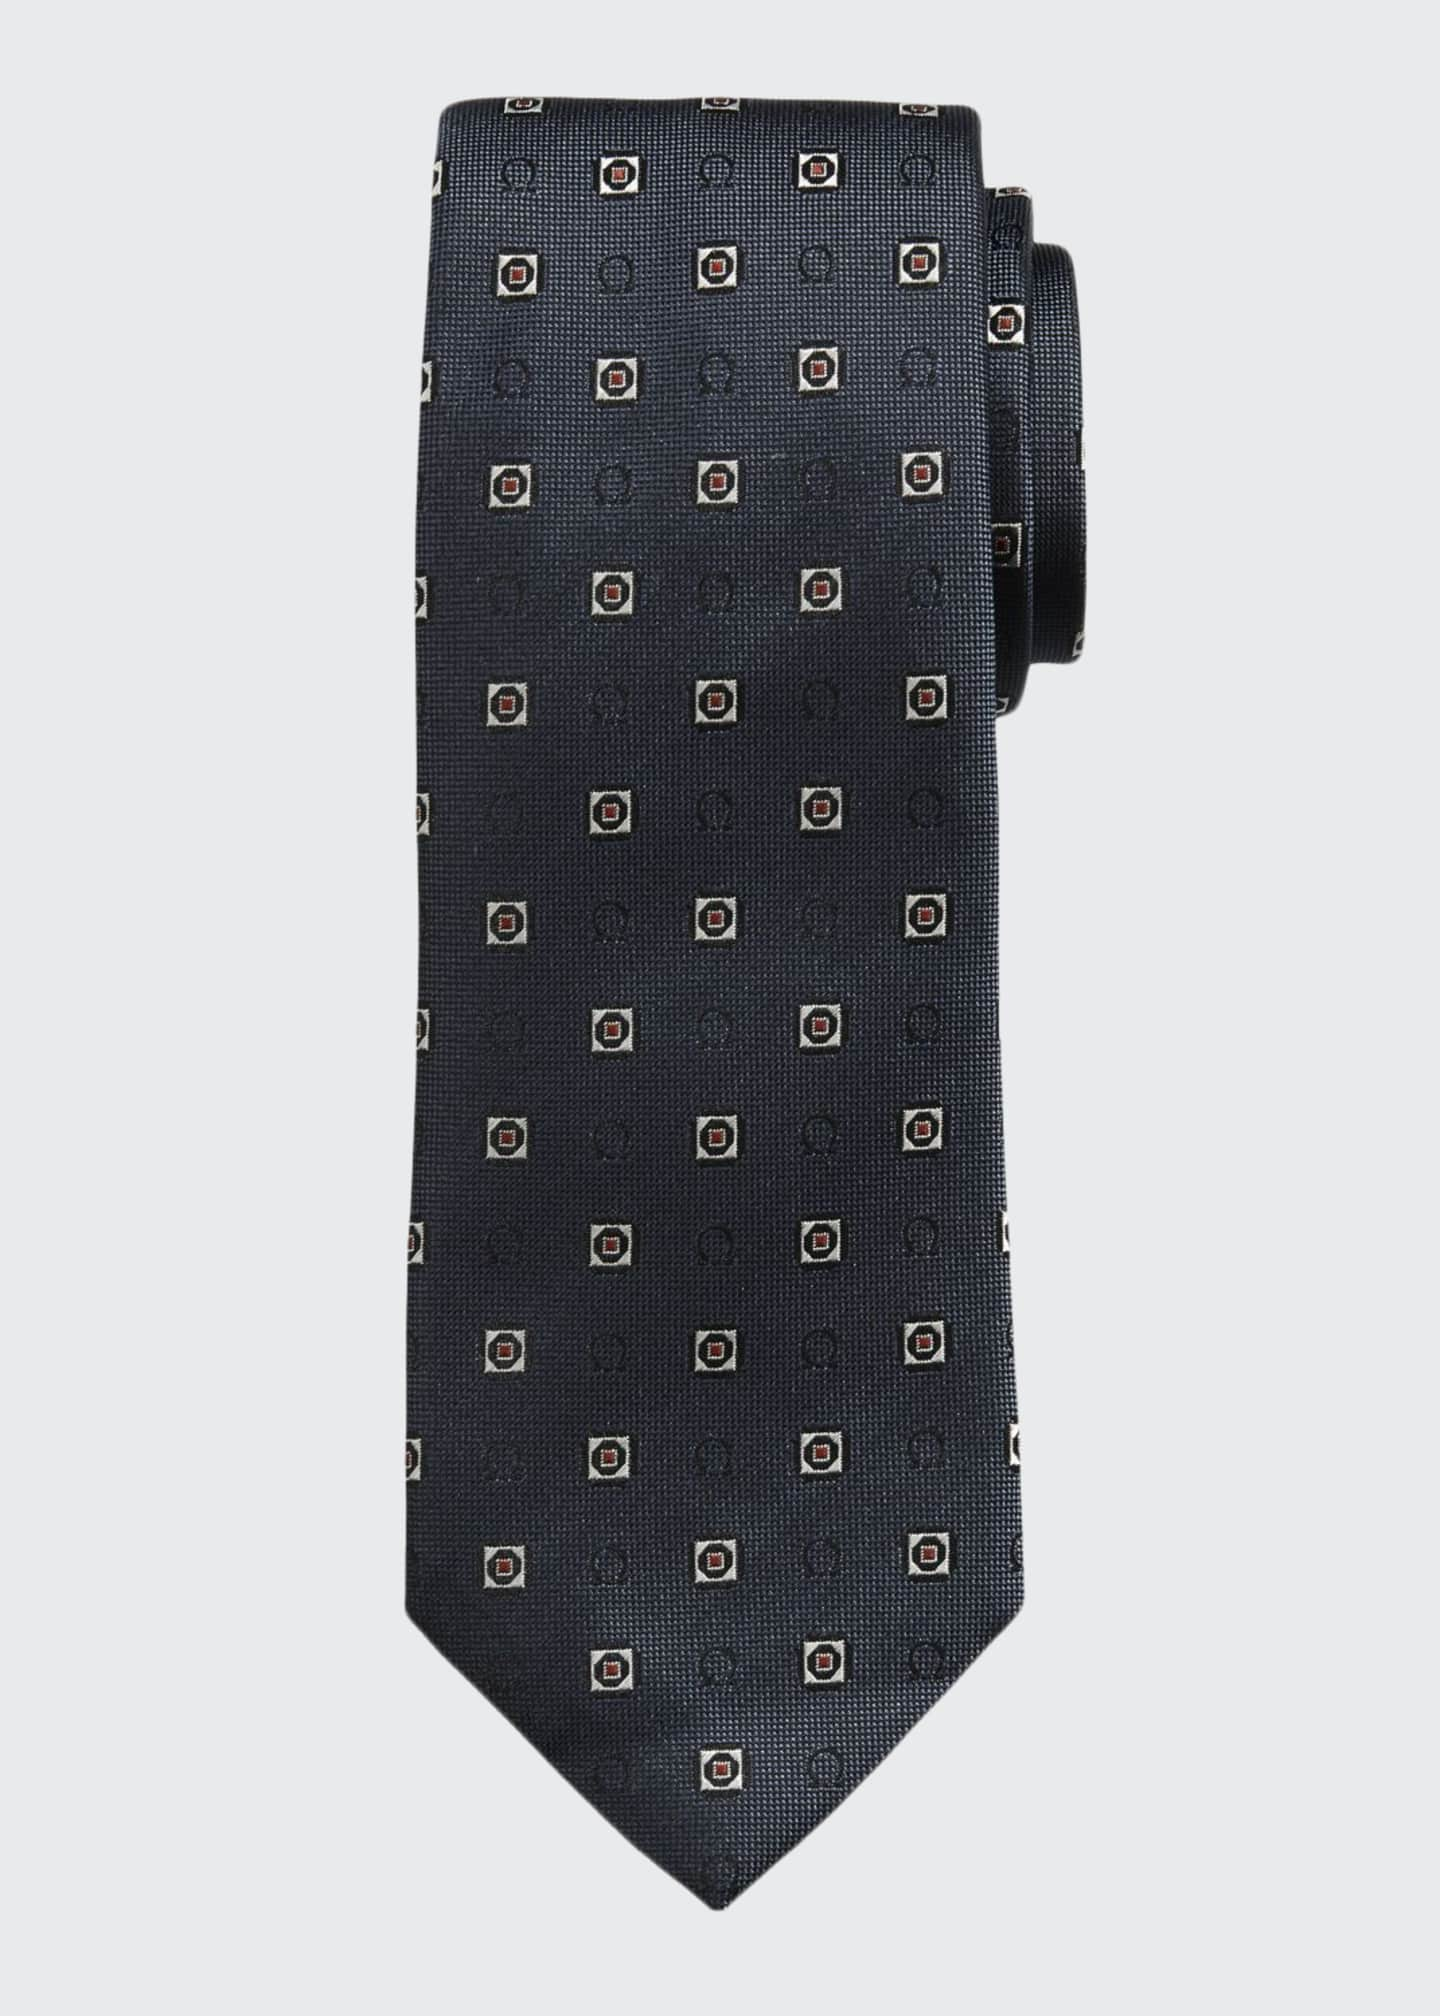 Salvatore Ferragamo Men's Gancini Medallion Silk Tie, Navy